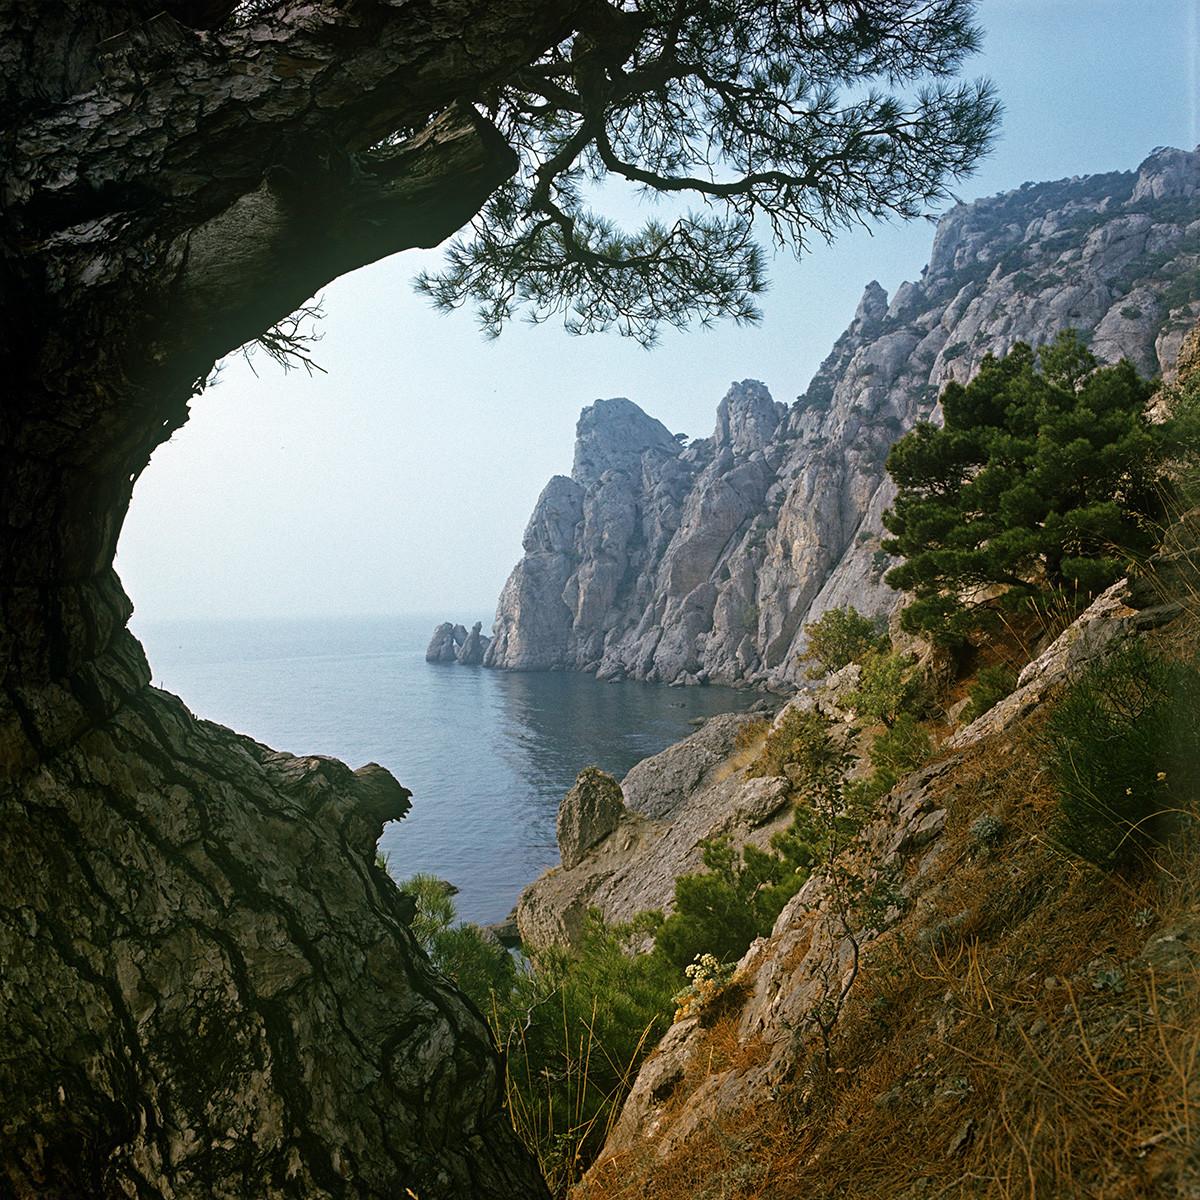 Narava na južni obali Krima, 1981